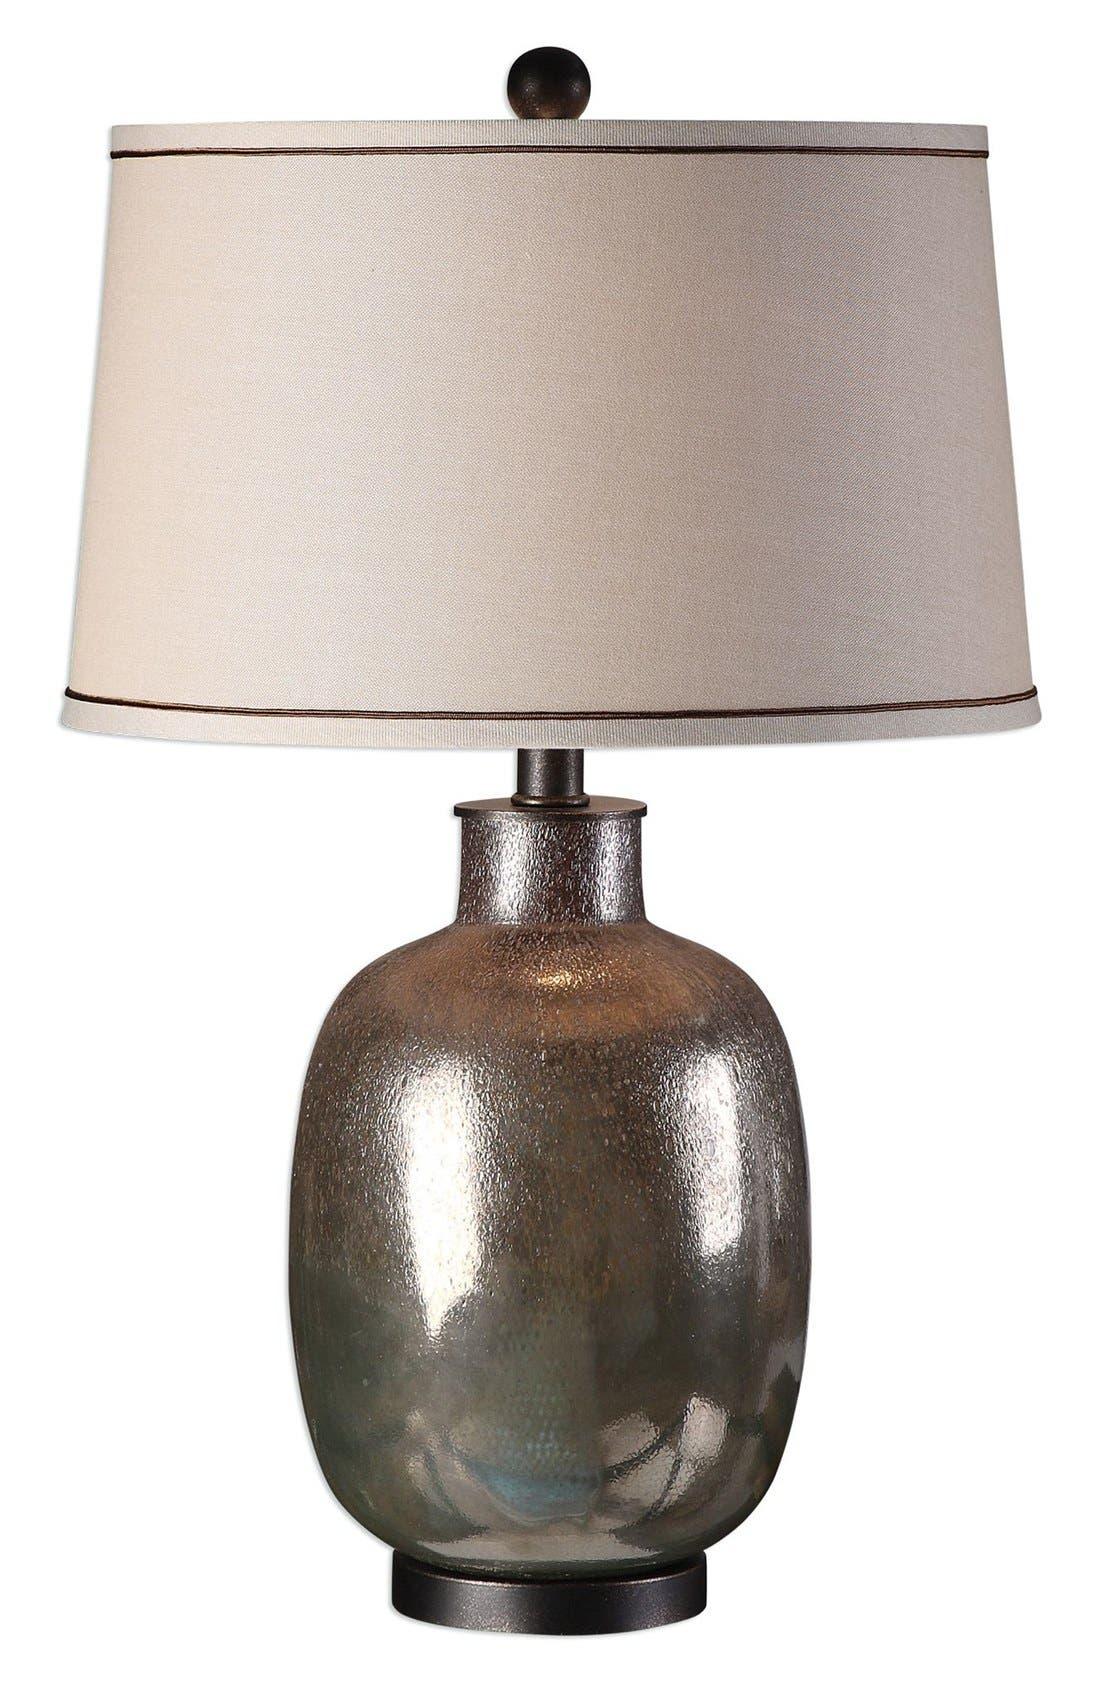 Glazed Glass Table Lamp,                             Main thumbnail 1, color,                             020